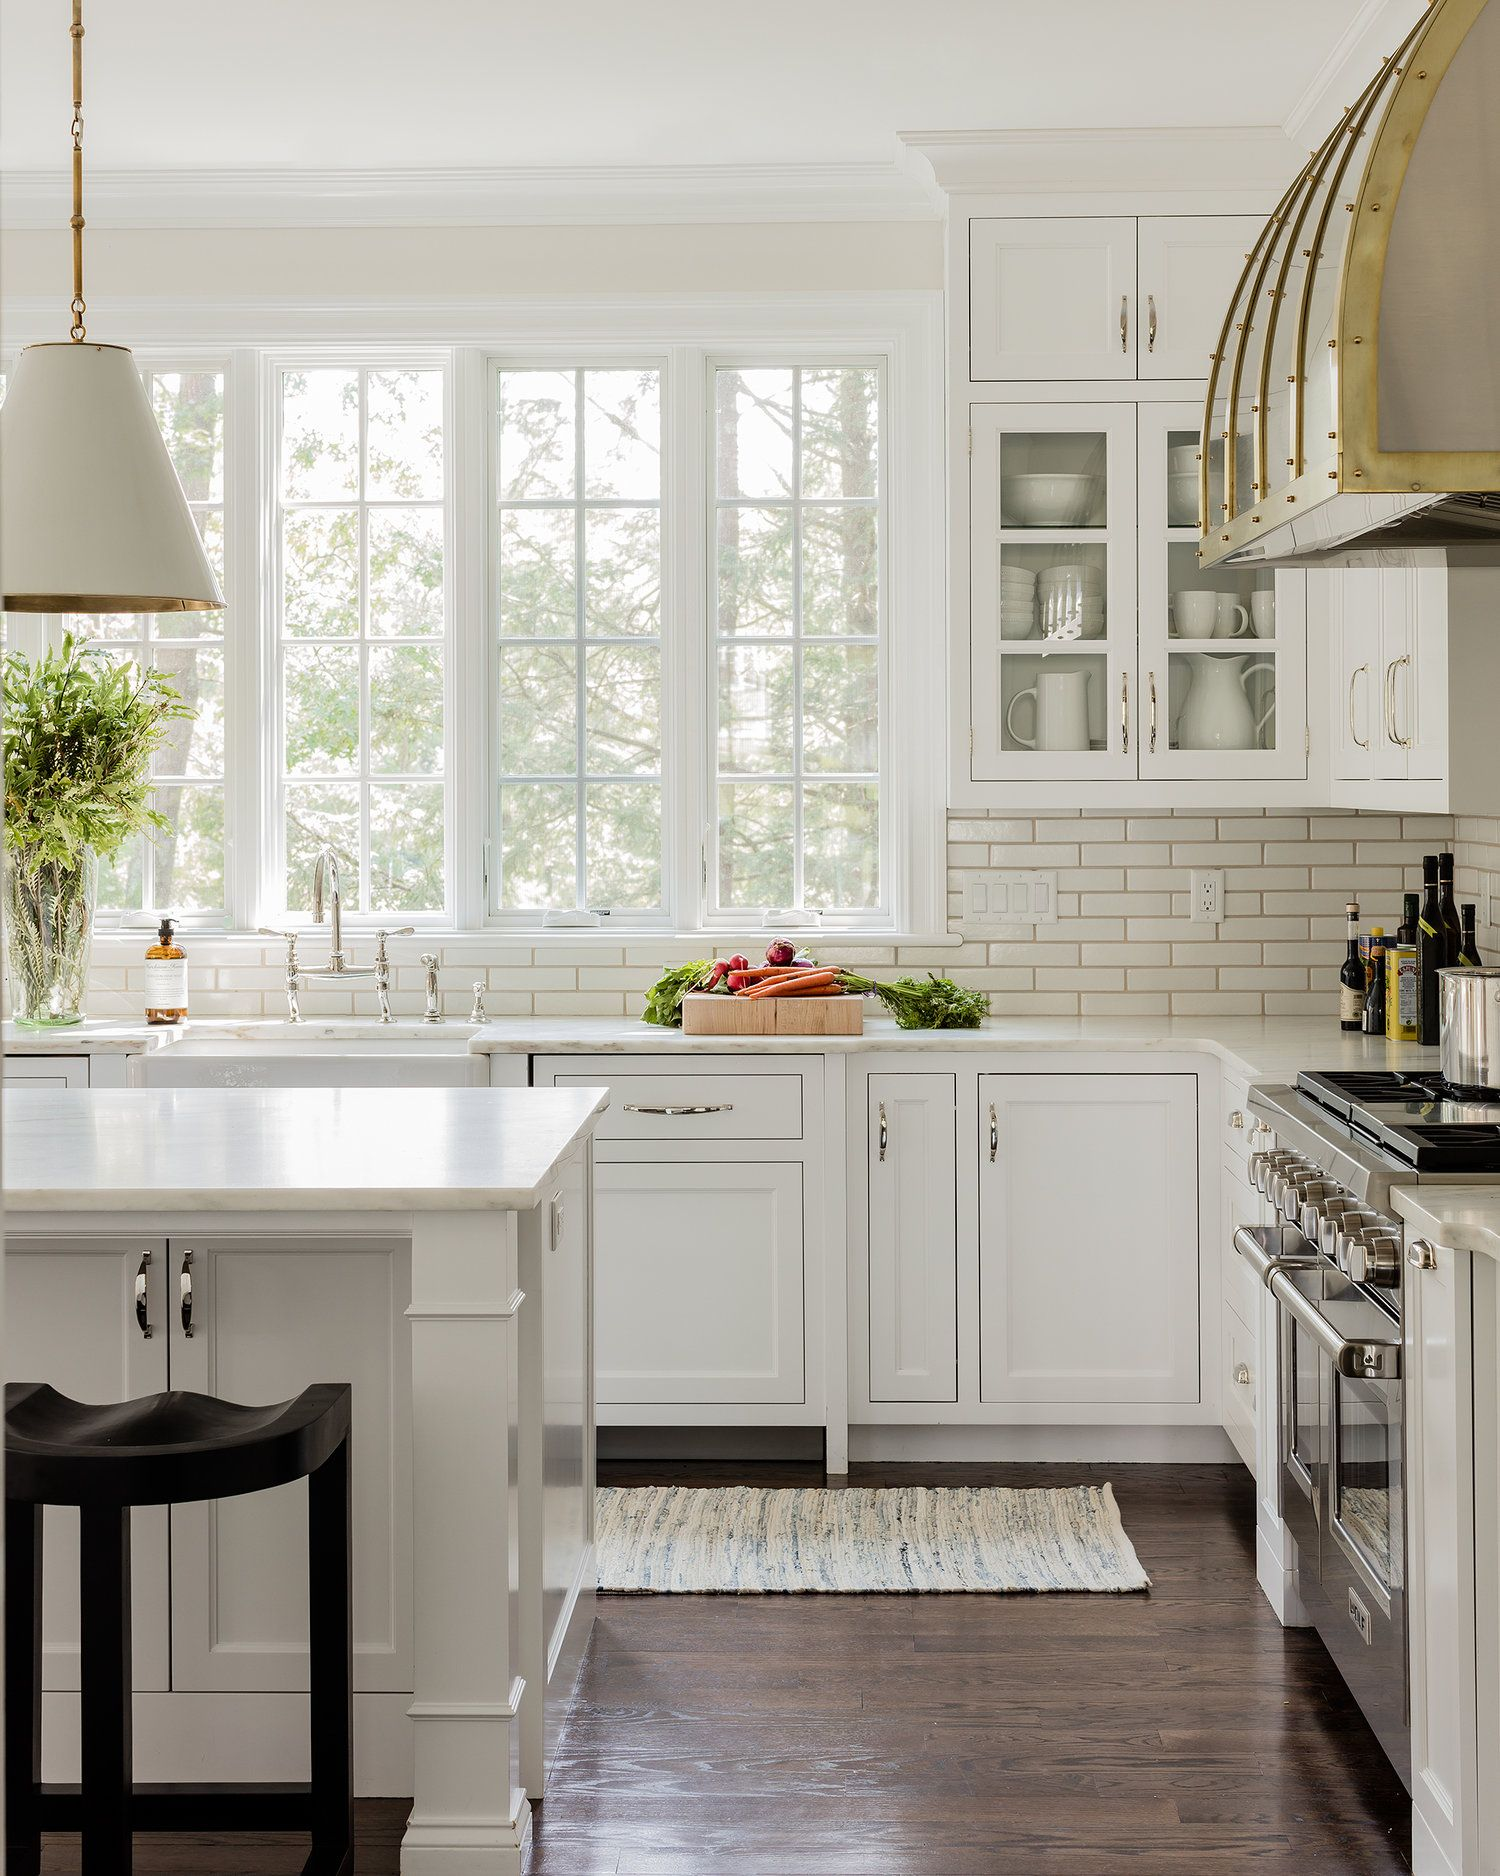 Big Window Over Kitchen Sink Classic White Kitchen Interior Design Kitchen Kitchen Interior